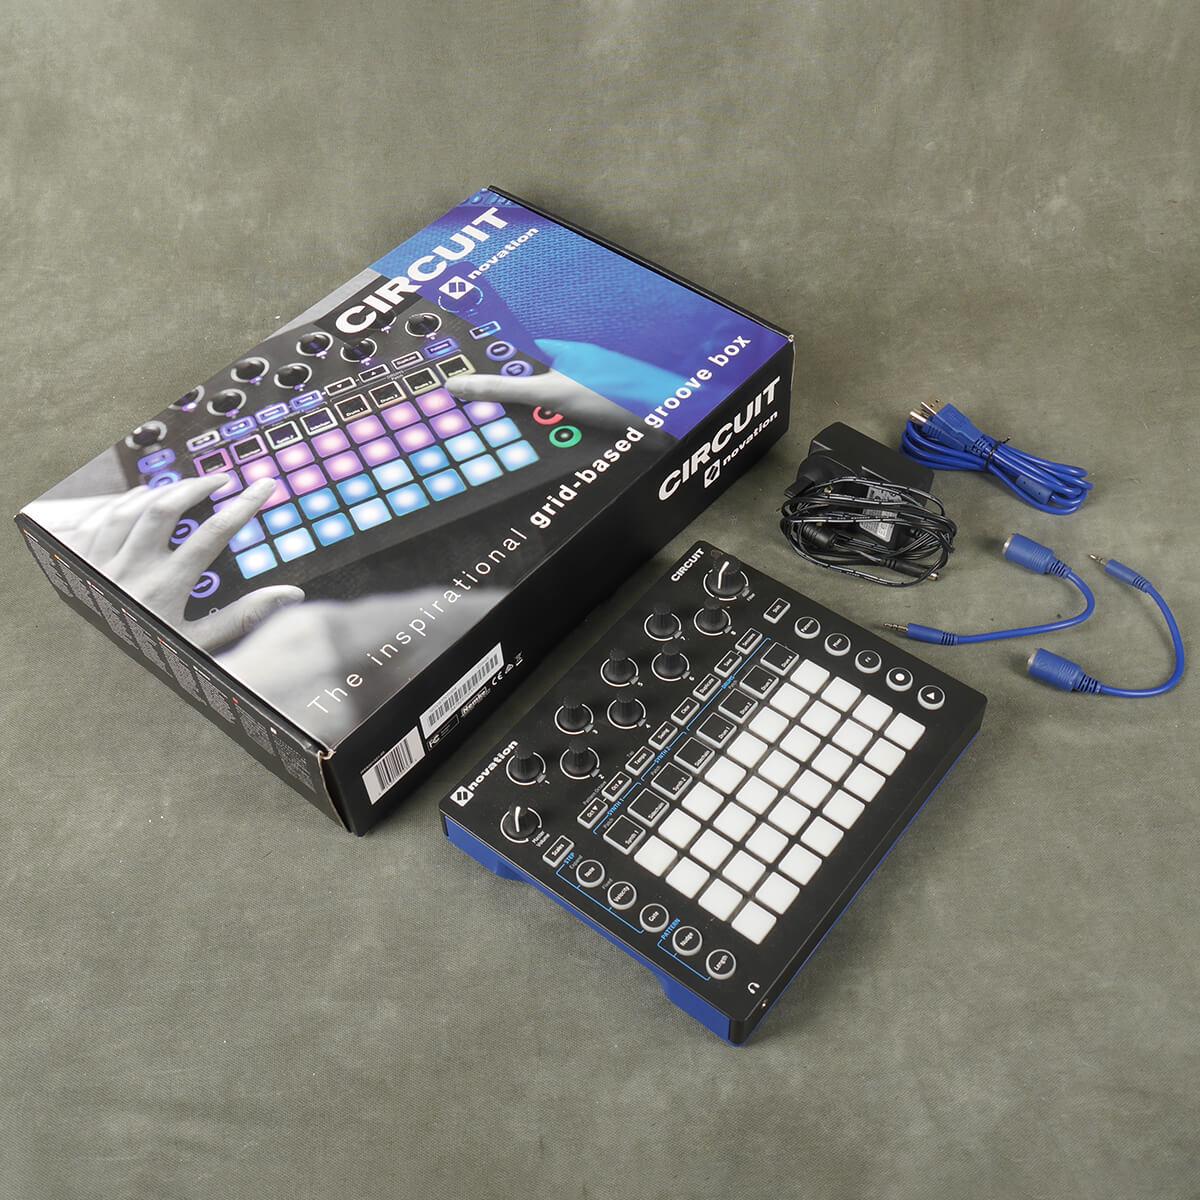 Novation Circuit Groovebox Synth w/Box & PSU - 2nd Hand